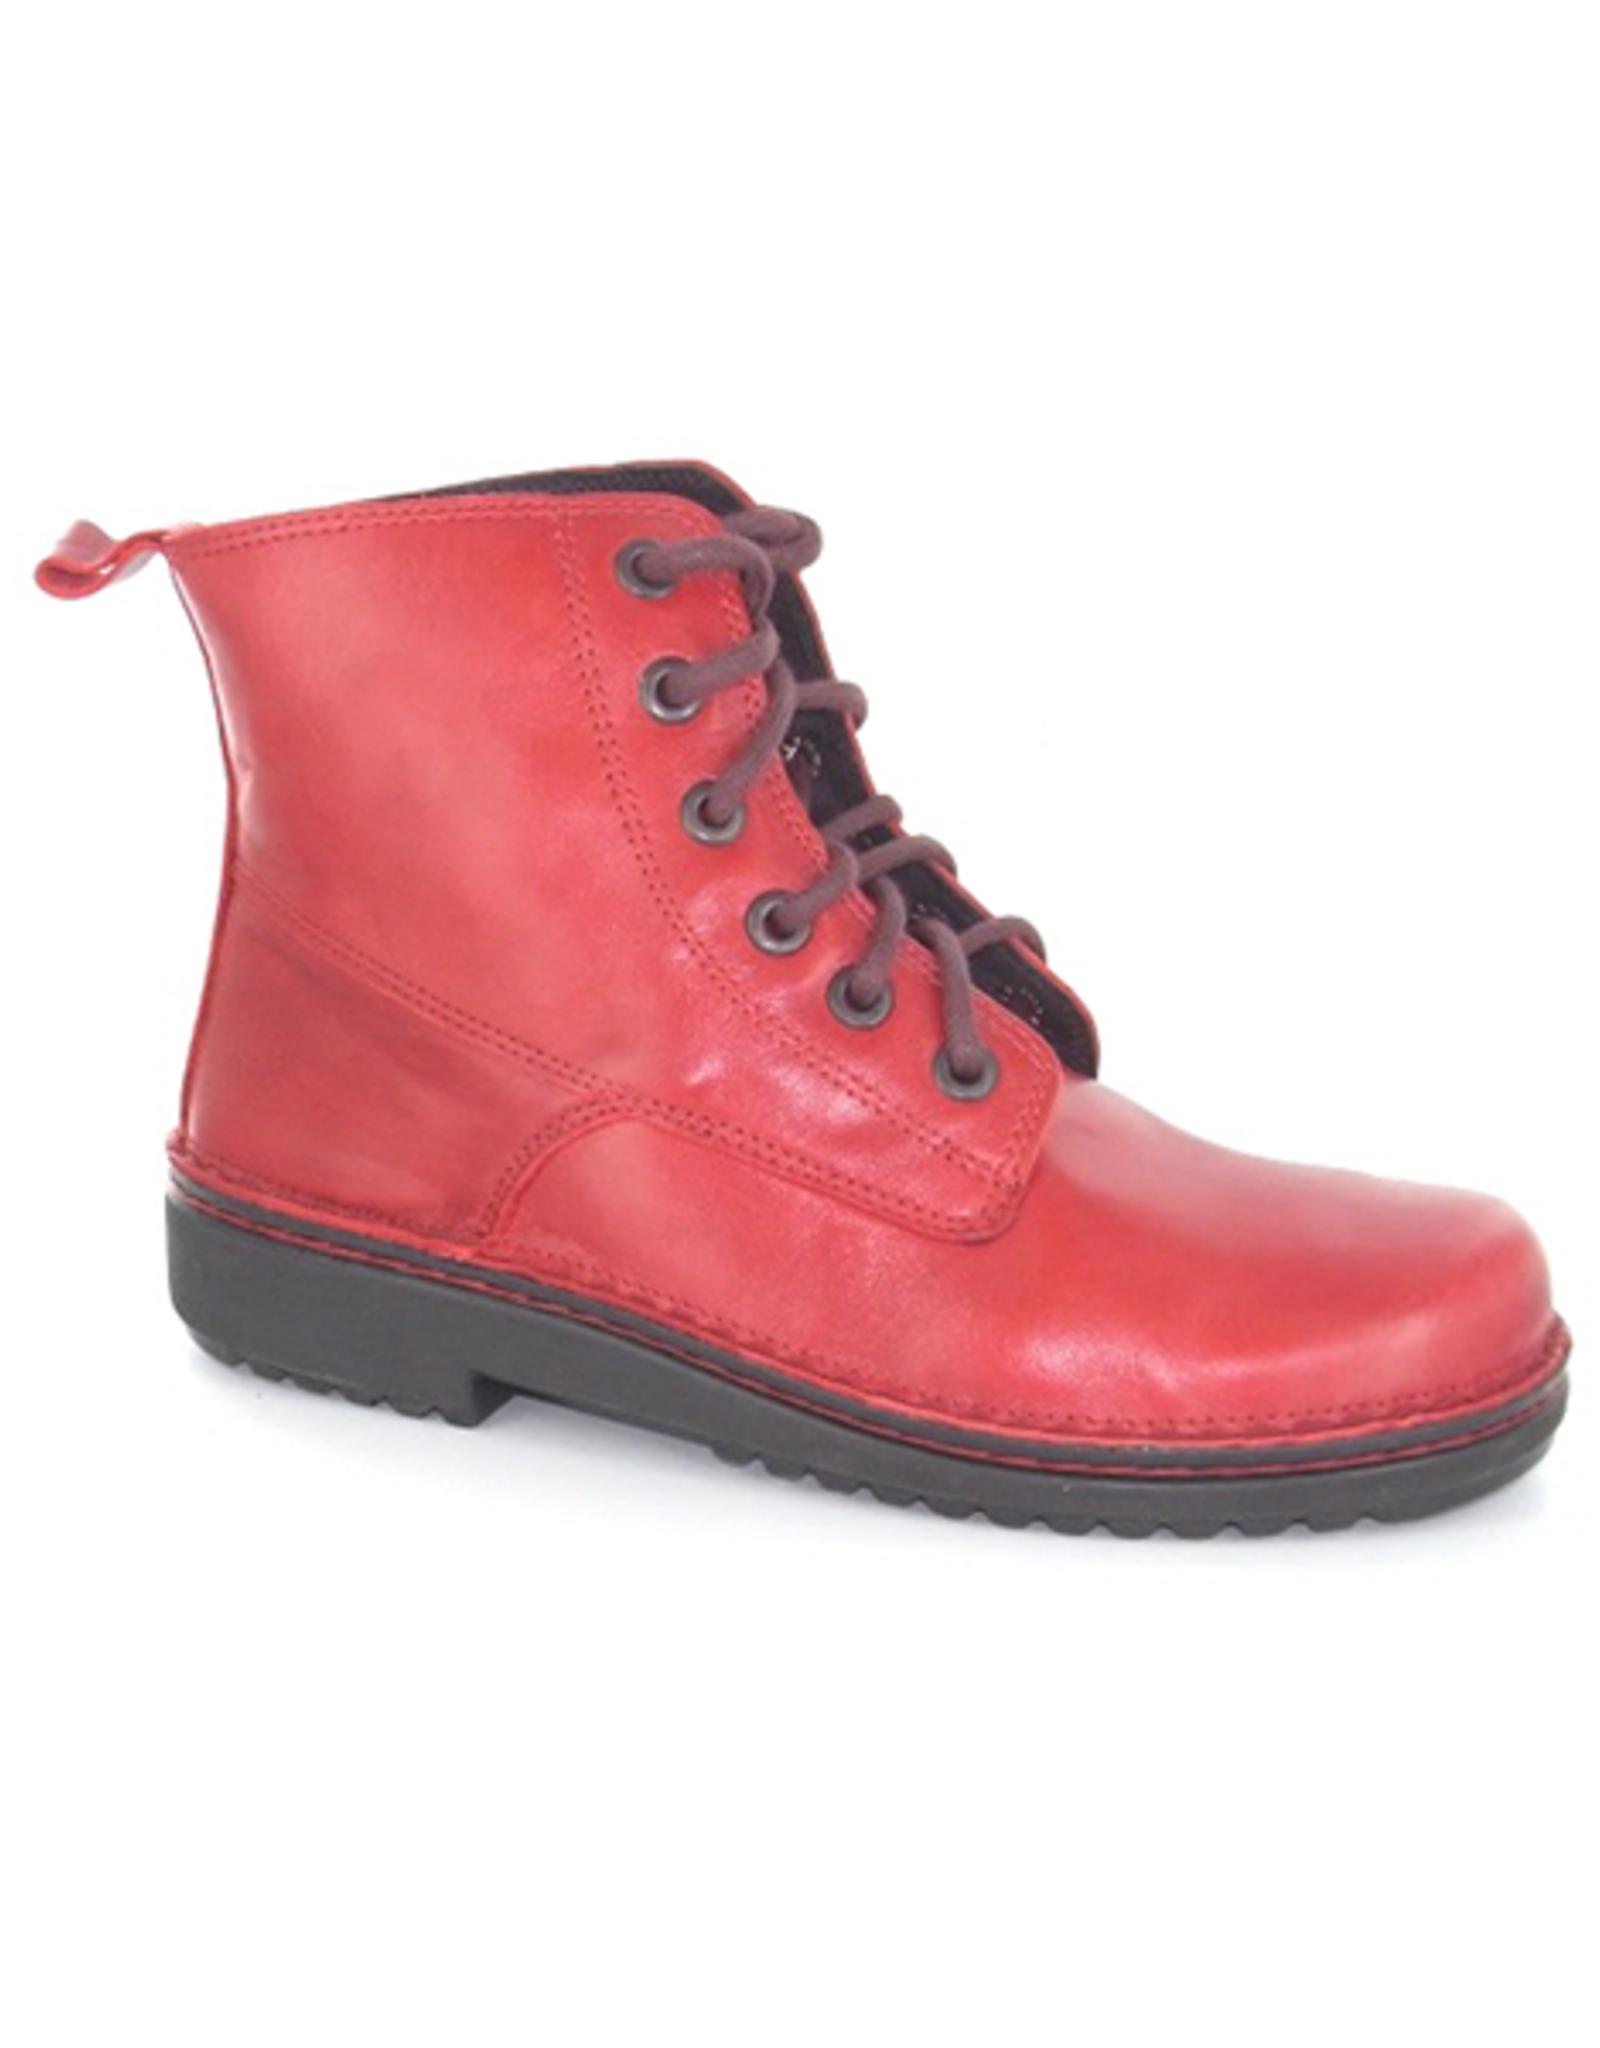 Naot Footwear Claudia in Poppy